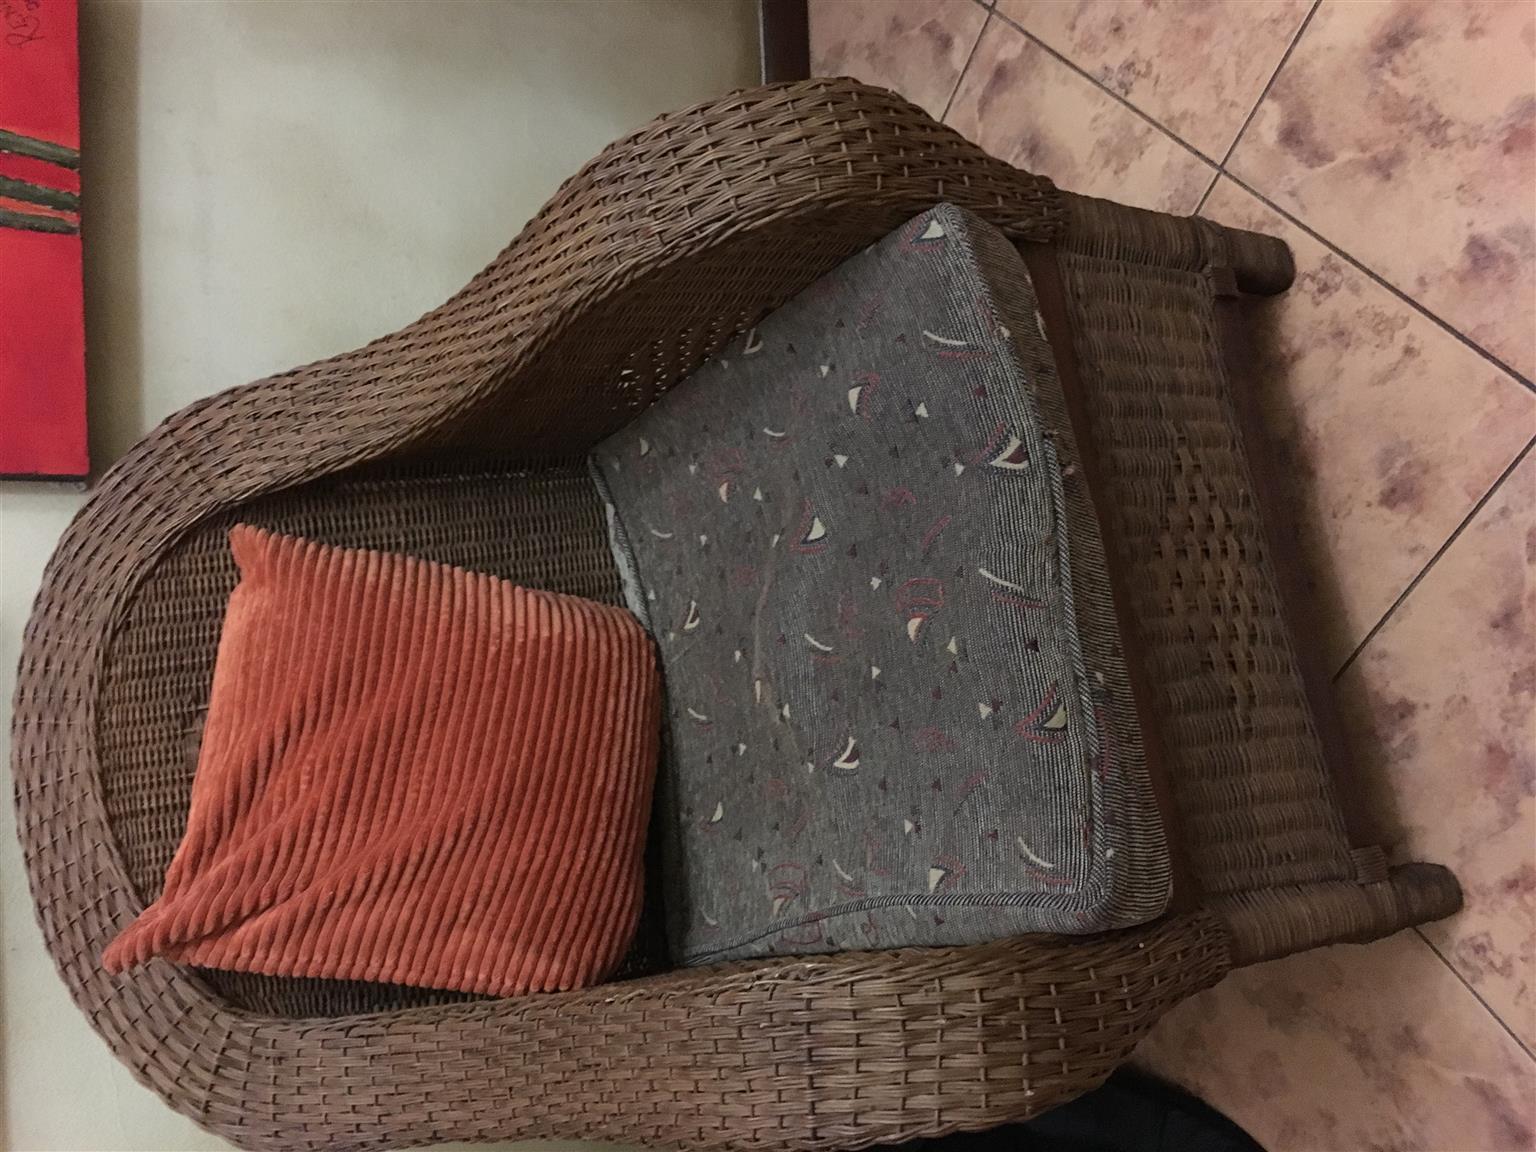 Patio chair and cushion